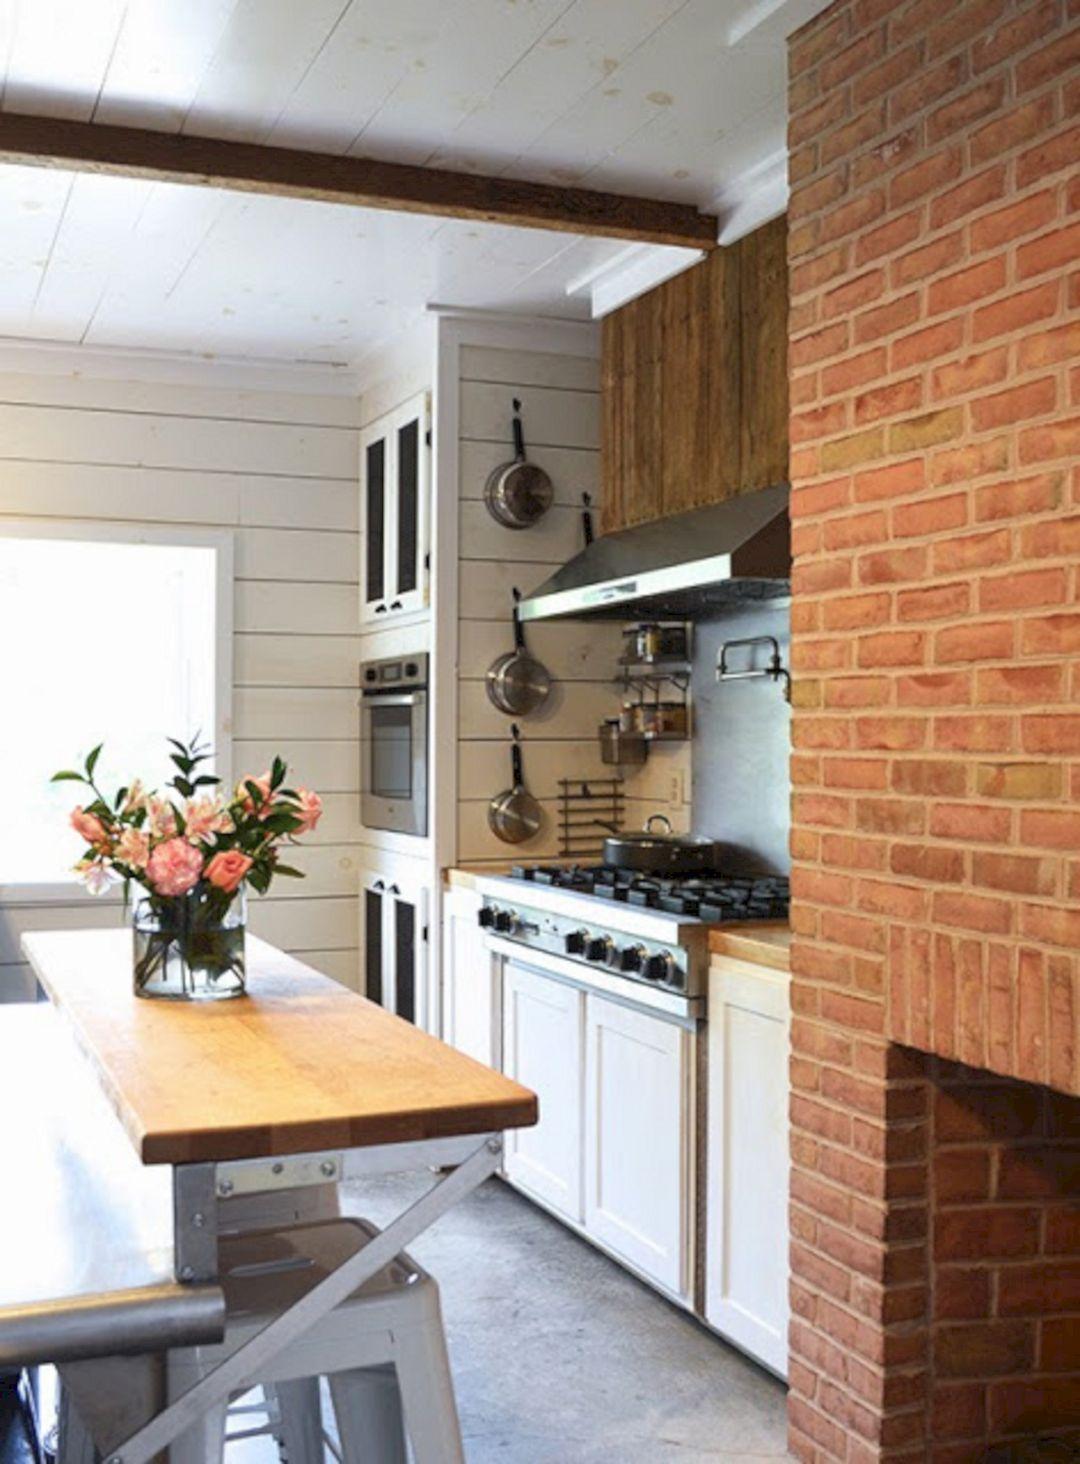 Kitchen Design Idea Unique Wicked 24 Best Industrial Kitchen Design Ideas To Make Your Home Design Decoration